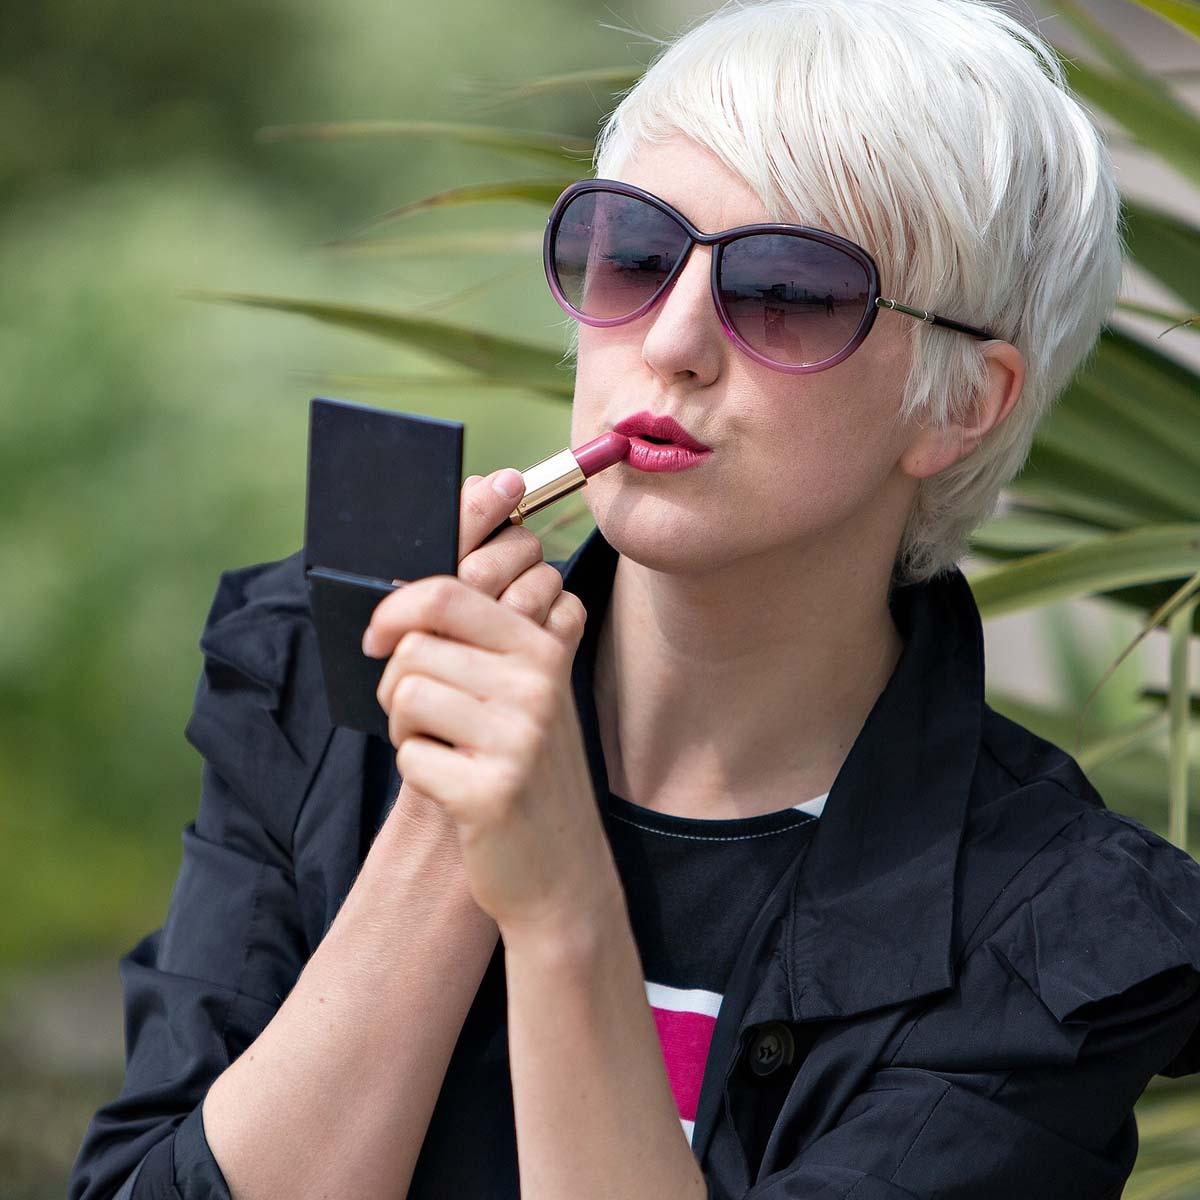 Lippenstift Makeup Schminken